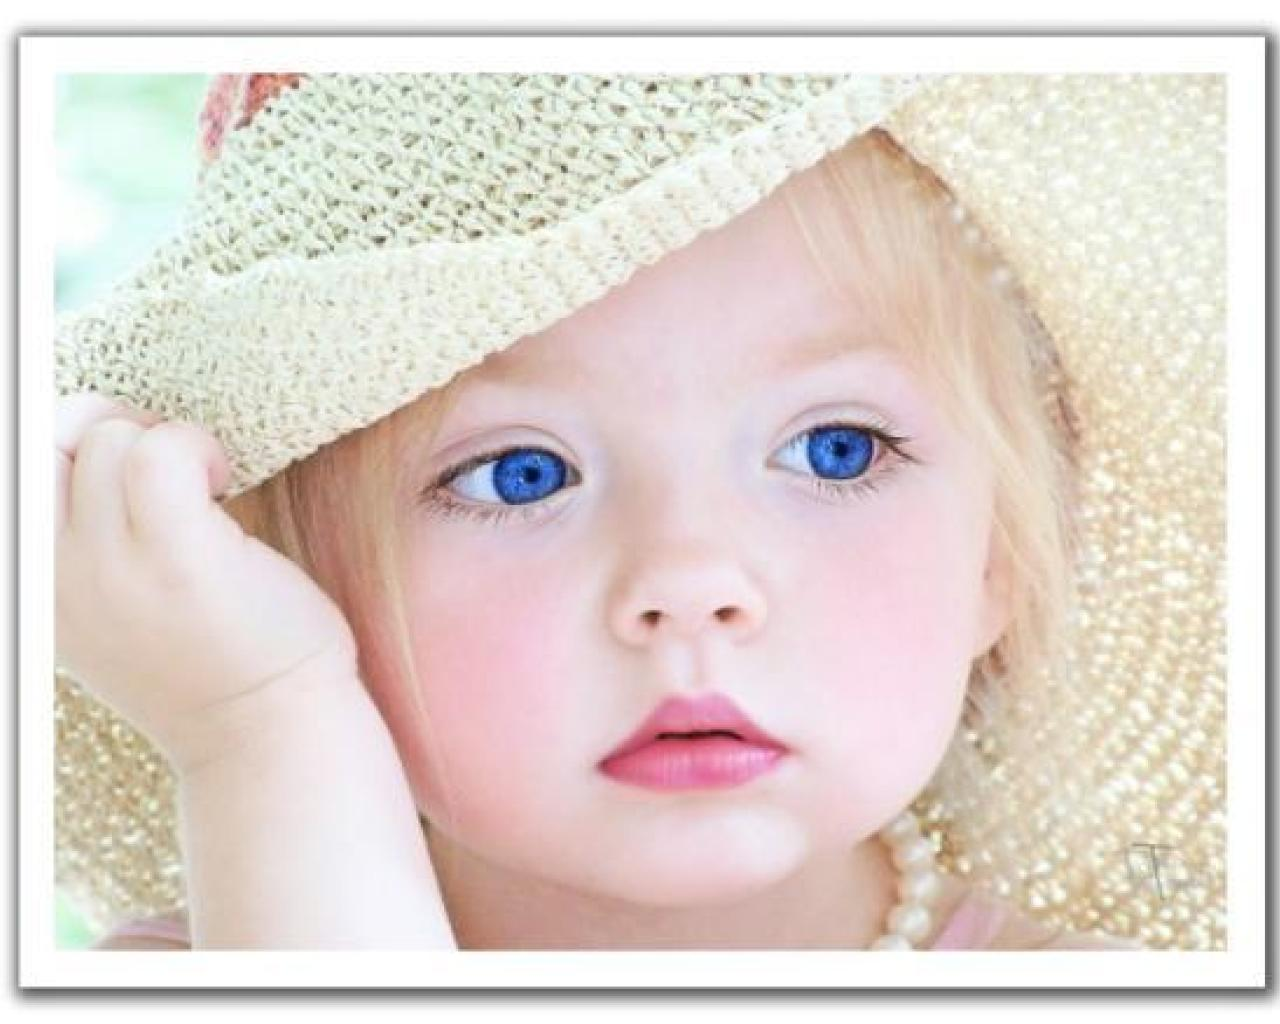 Cute Babies: Cute Babies Photo